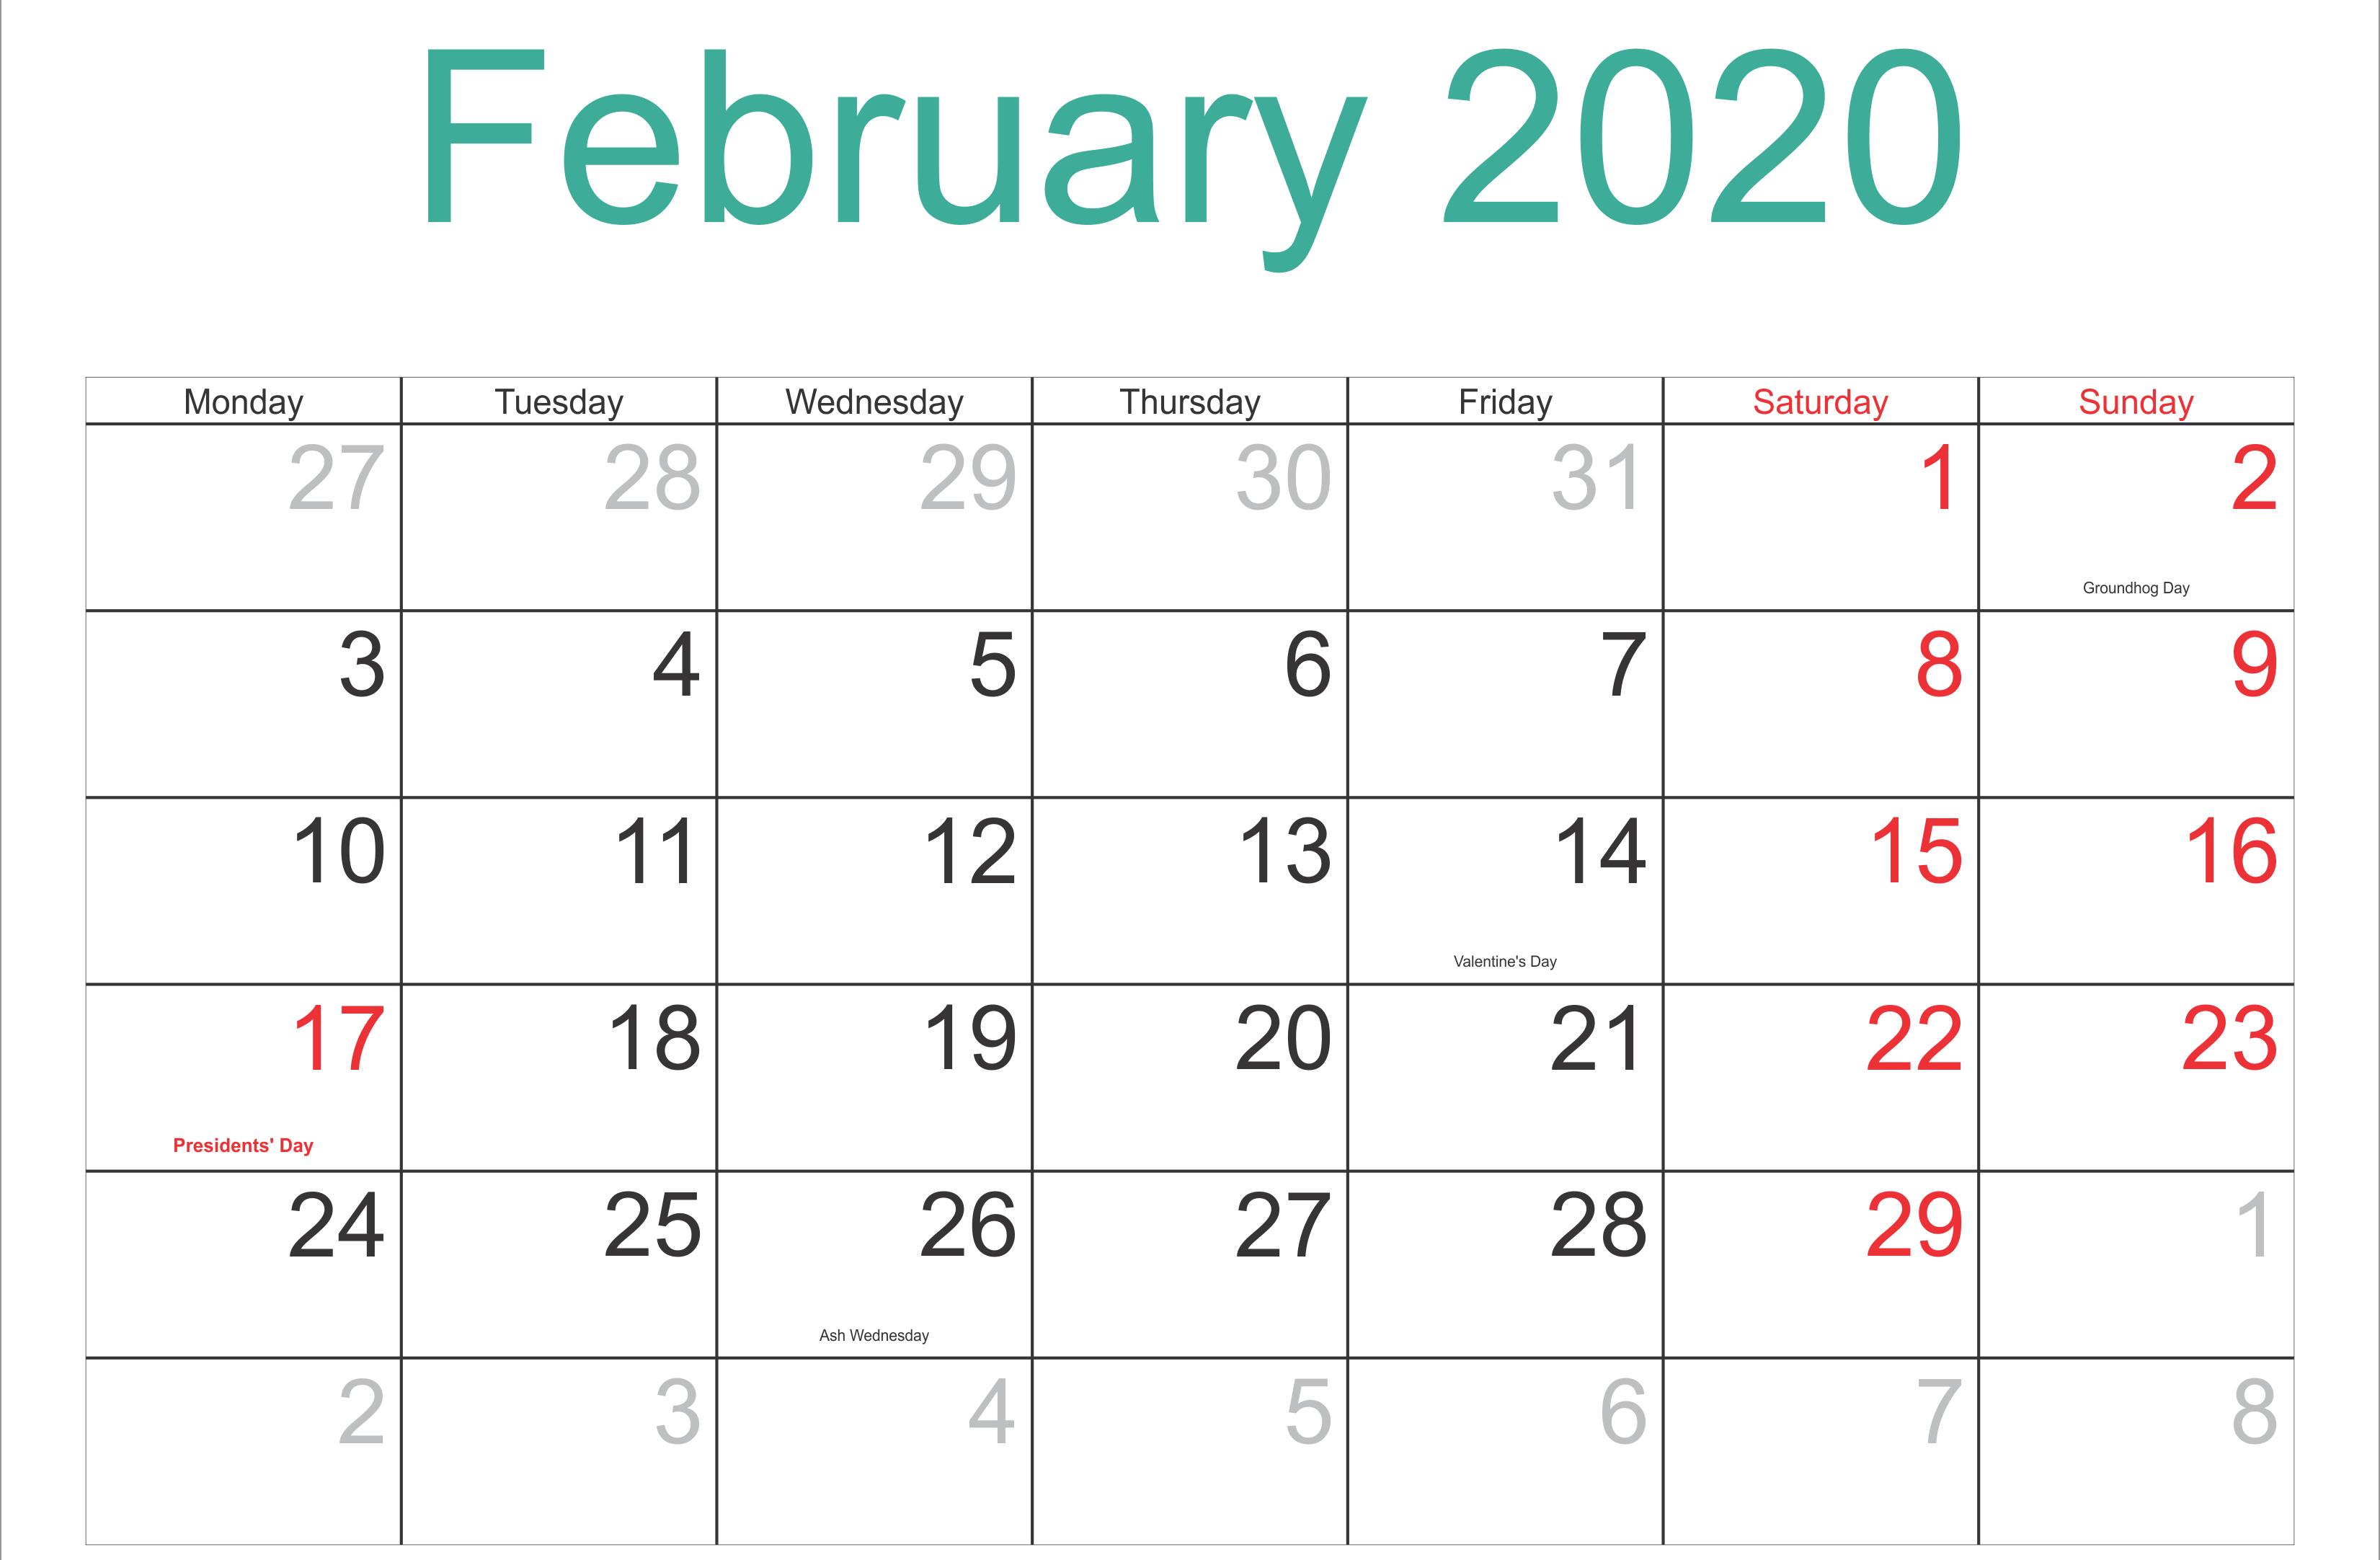 February 2020 Calendar With Holidays Usa Uk Canada India